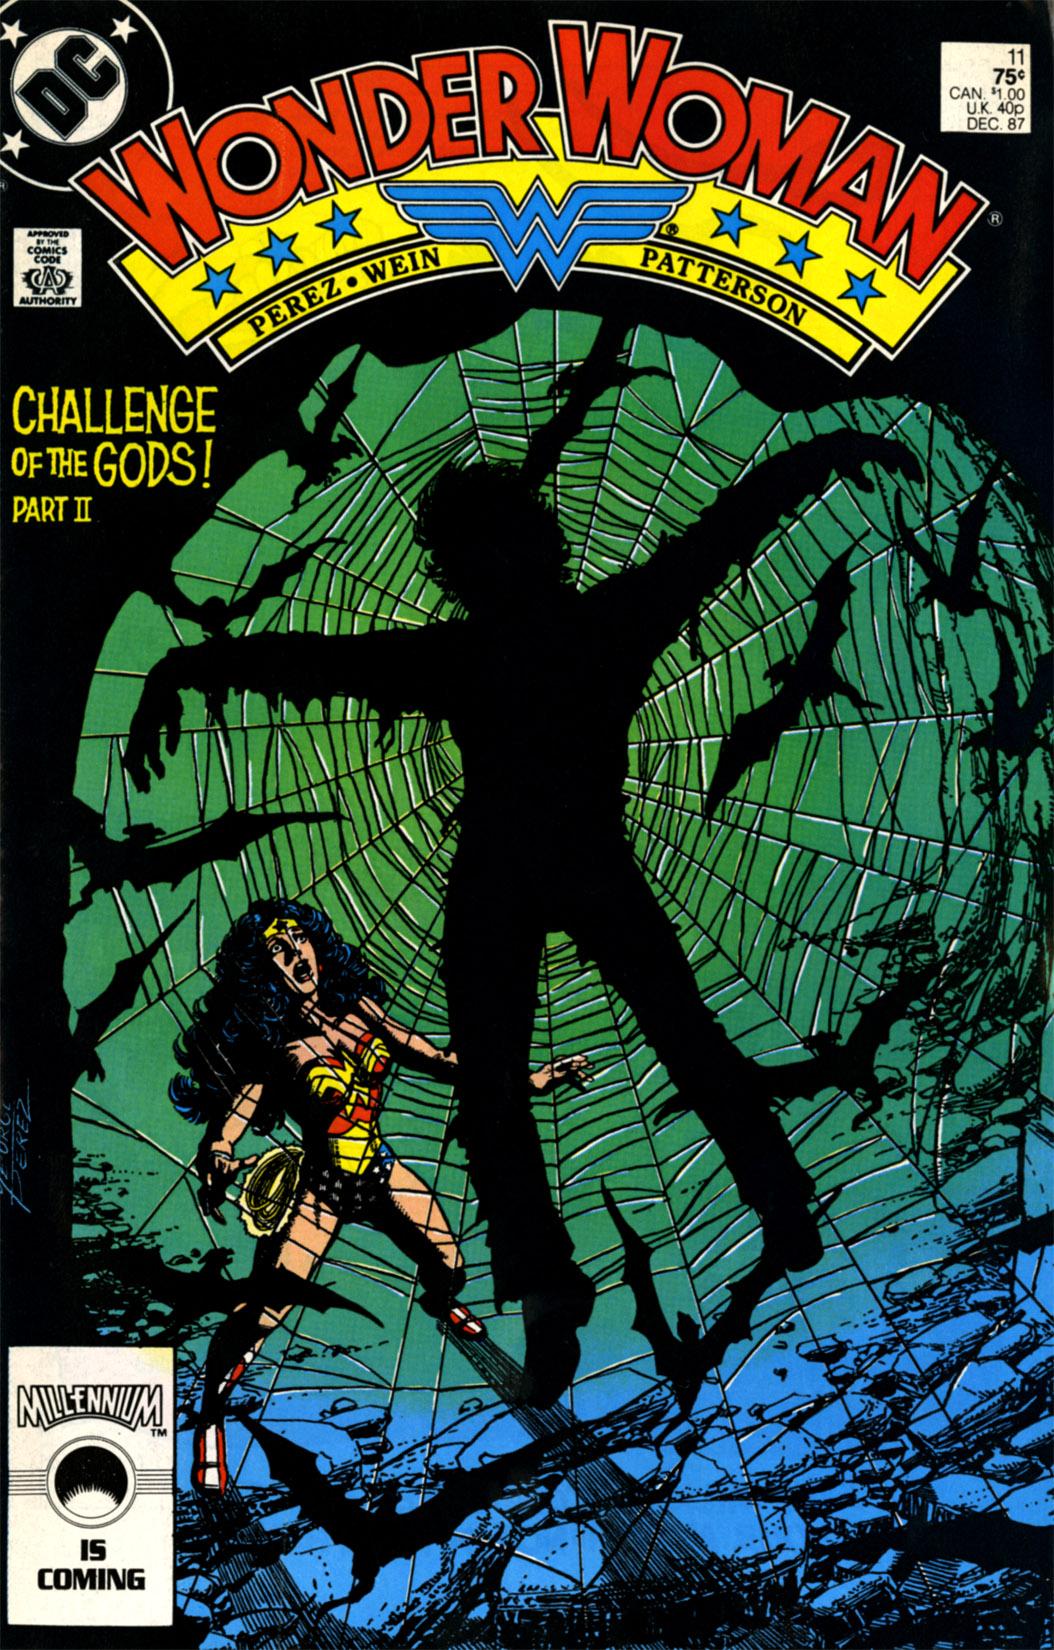 Read online Wonder Woman (1987) comic -  Issue #11 - 1